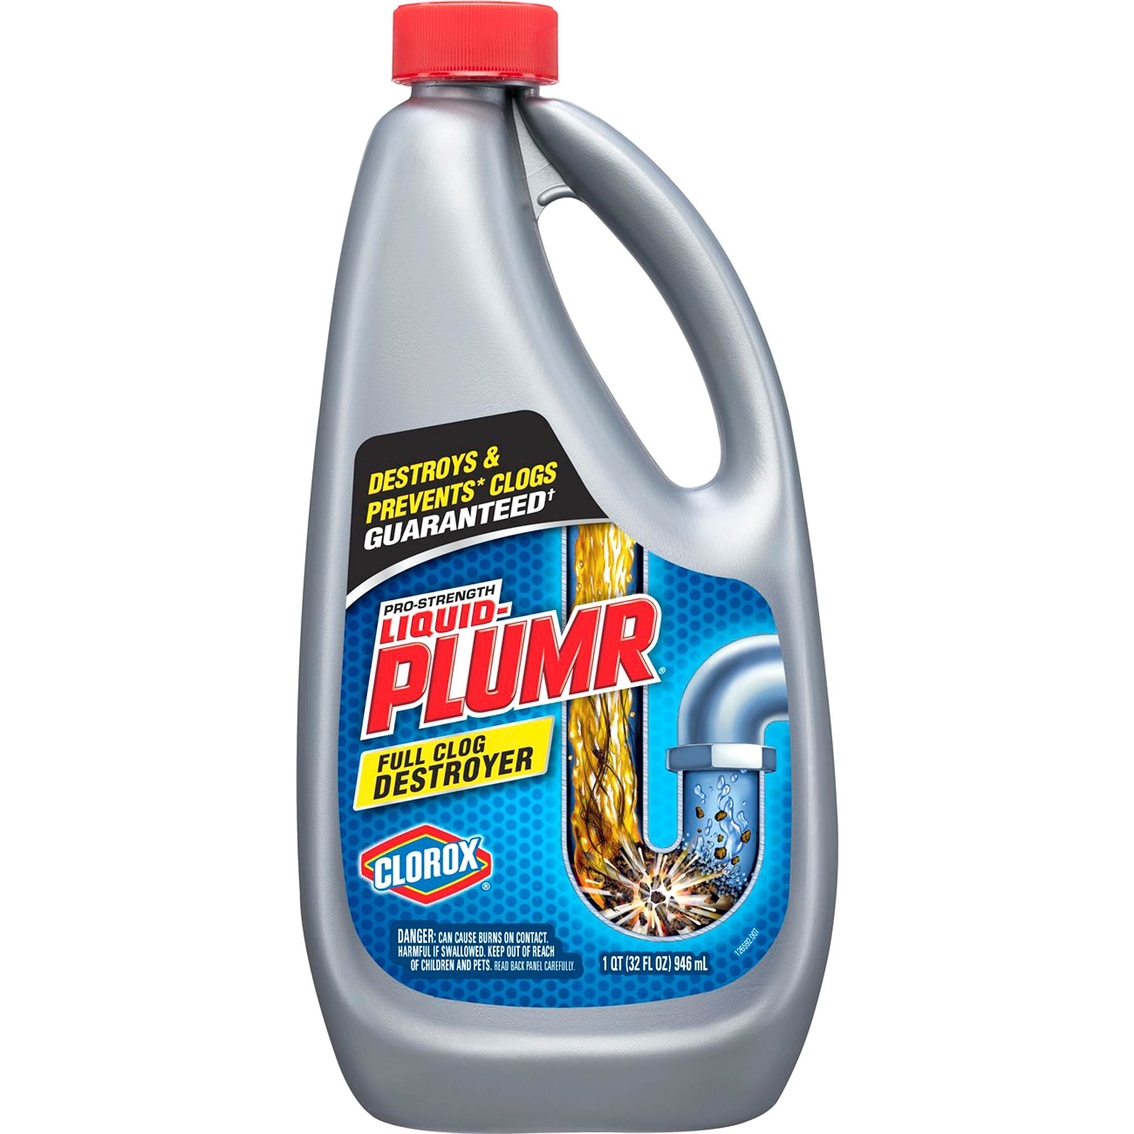 Liquid Plumr Professional Strength Full Clog Destroyer | Bathroom ...